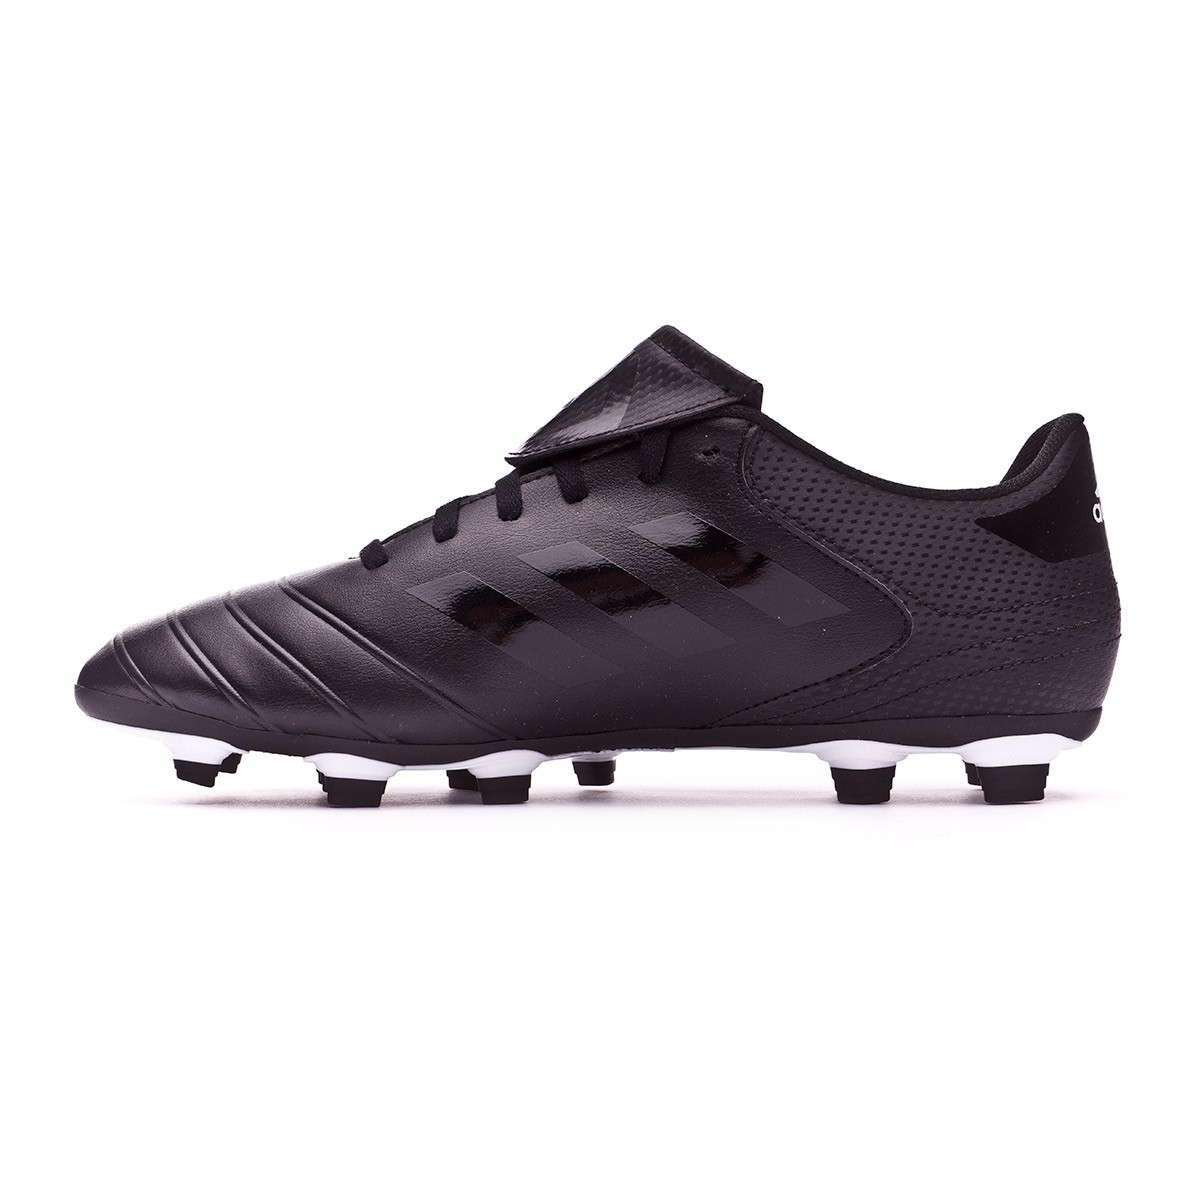 size 40 d7430 5a689 Bota de fútbol adidas Copa 18.4 FxG Core black-White - Tienda de fútbol  Fútbol Emotion